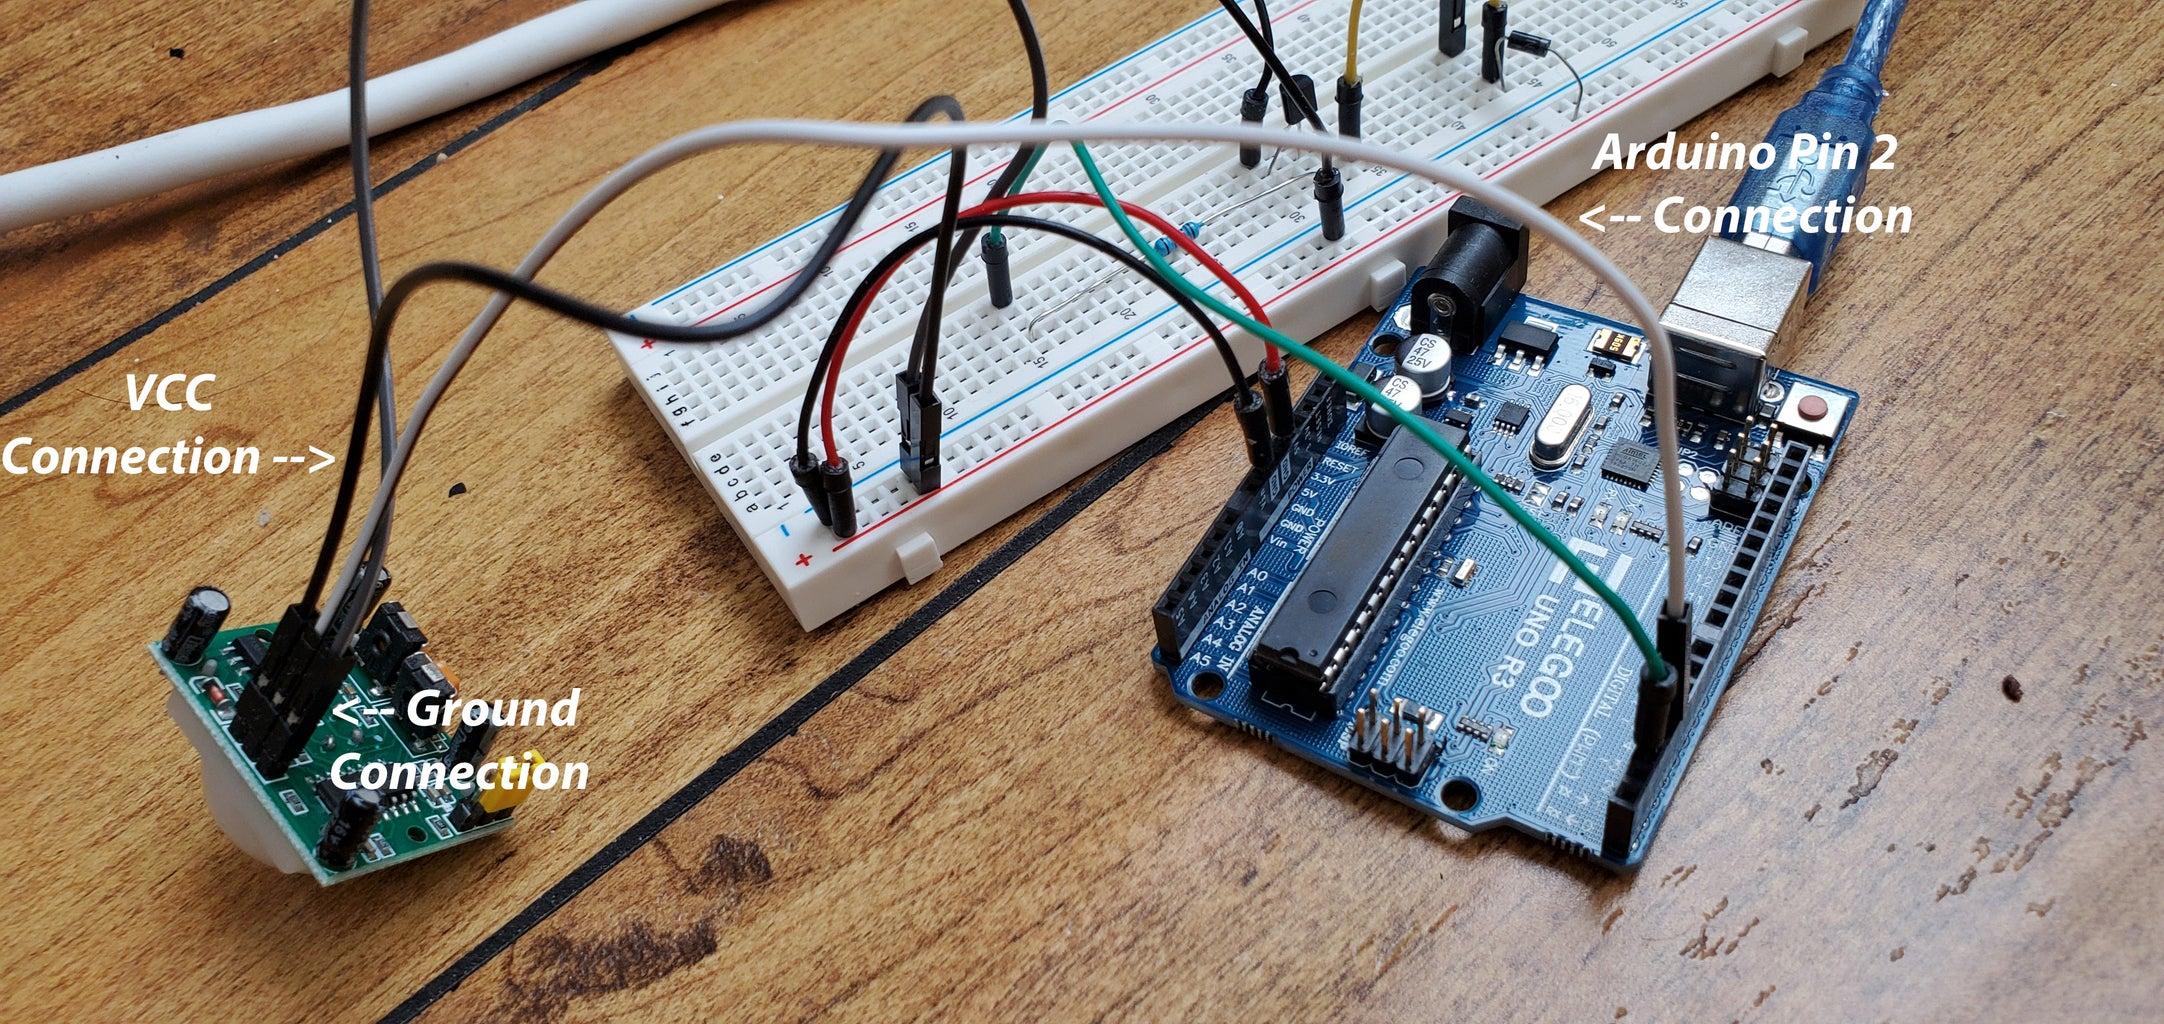 Connecting the PIR Motion Sensor